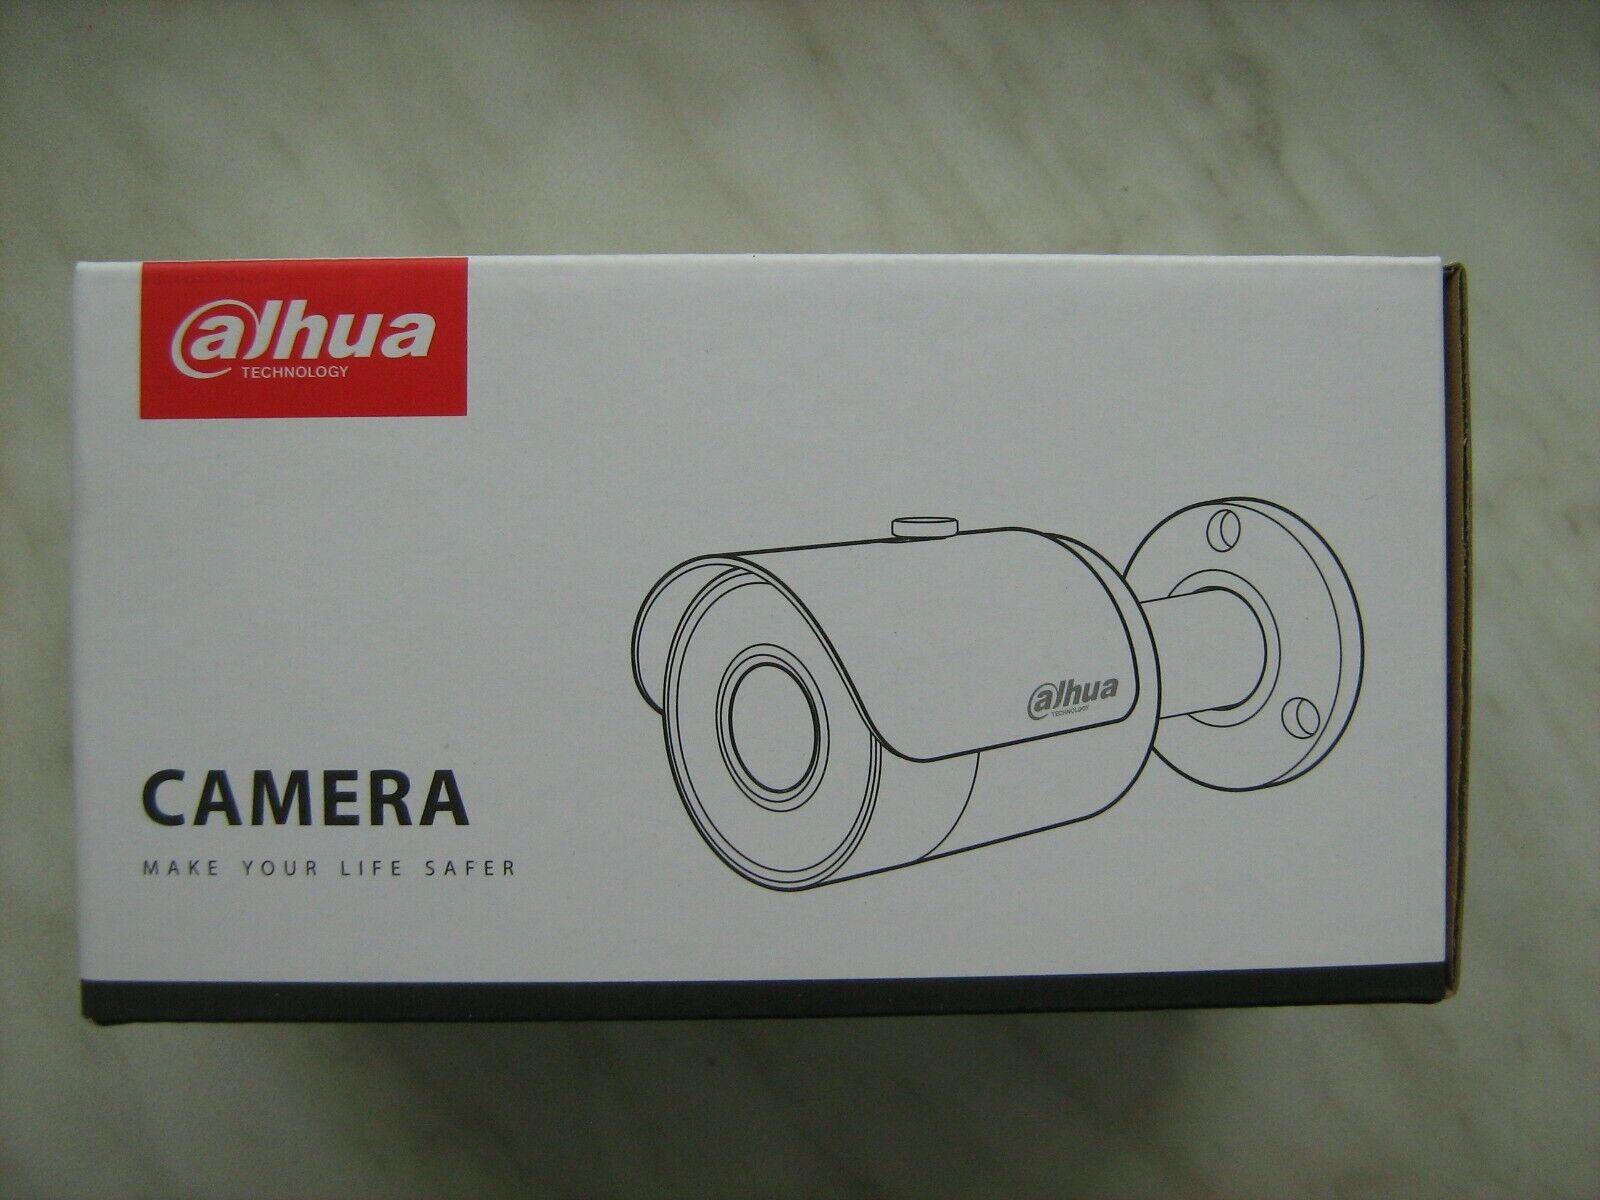 DAHUA 2MP HAC-HFW1200SP HD-CVI 3.6mm len ICR IR 30m Bullet Security Cameras